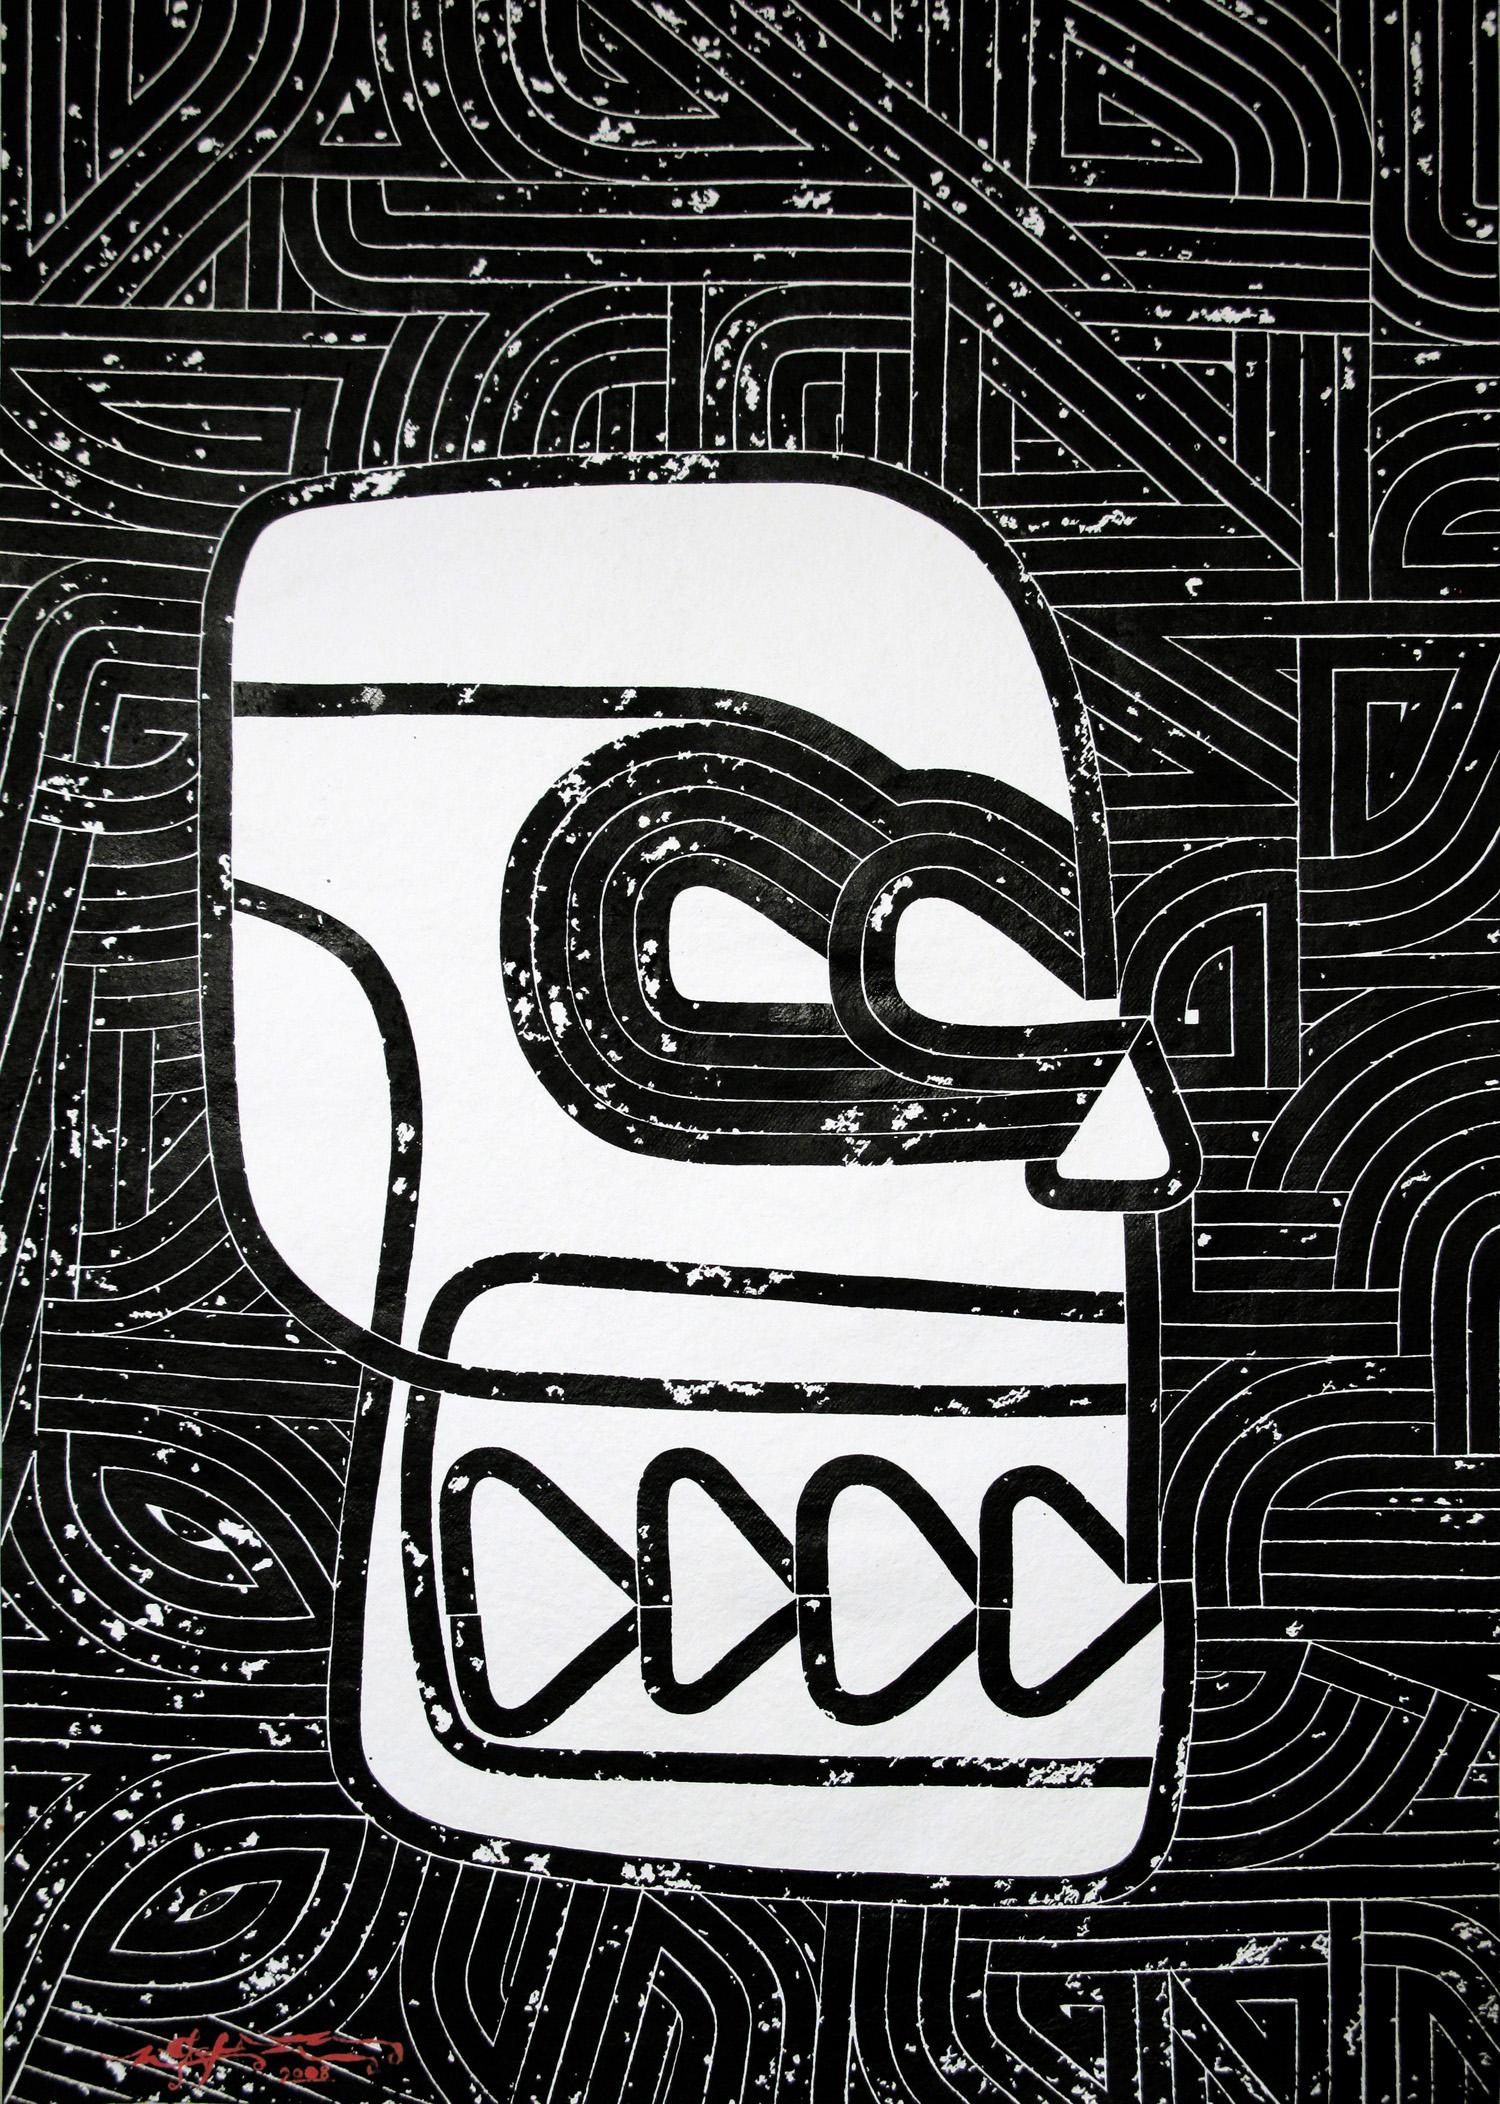 Phrenology Maximus, 2008 sumi ink on handmade paper 52 x 36 inch